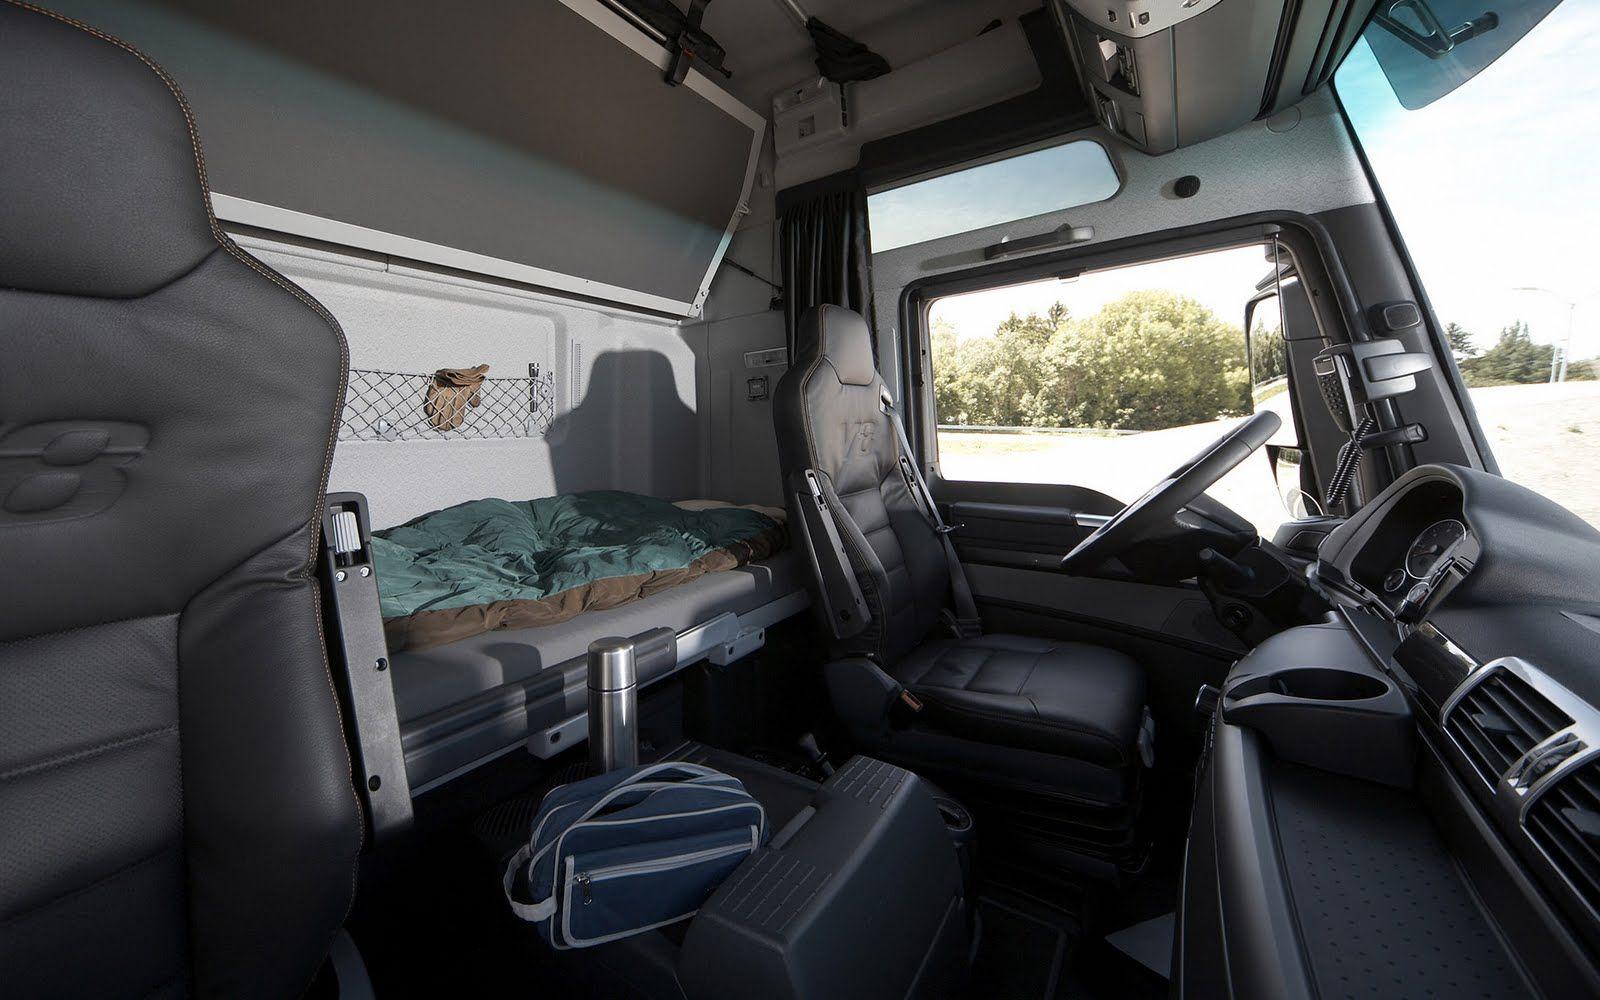 Man Tgx 4 2 Xxl Cab Interior Vehicke Design Comofrt Kabina Fura Interer Doroga Truck Interior Trucks Car Seats